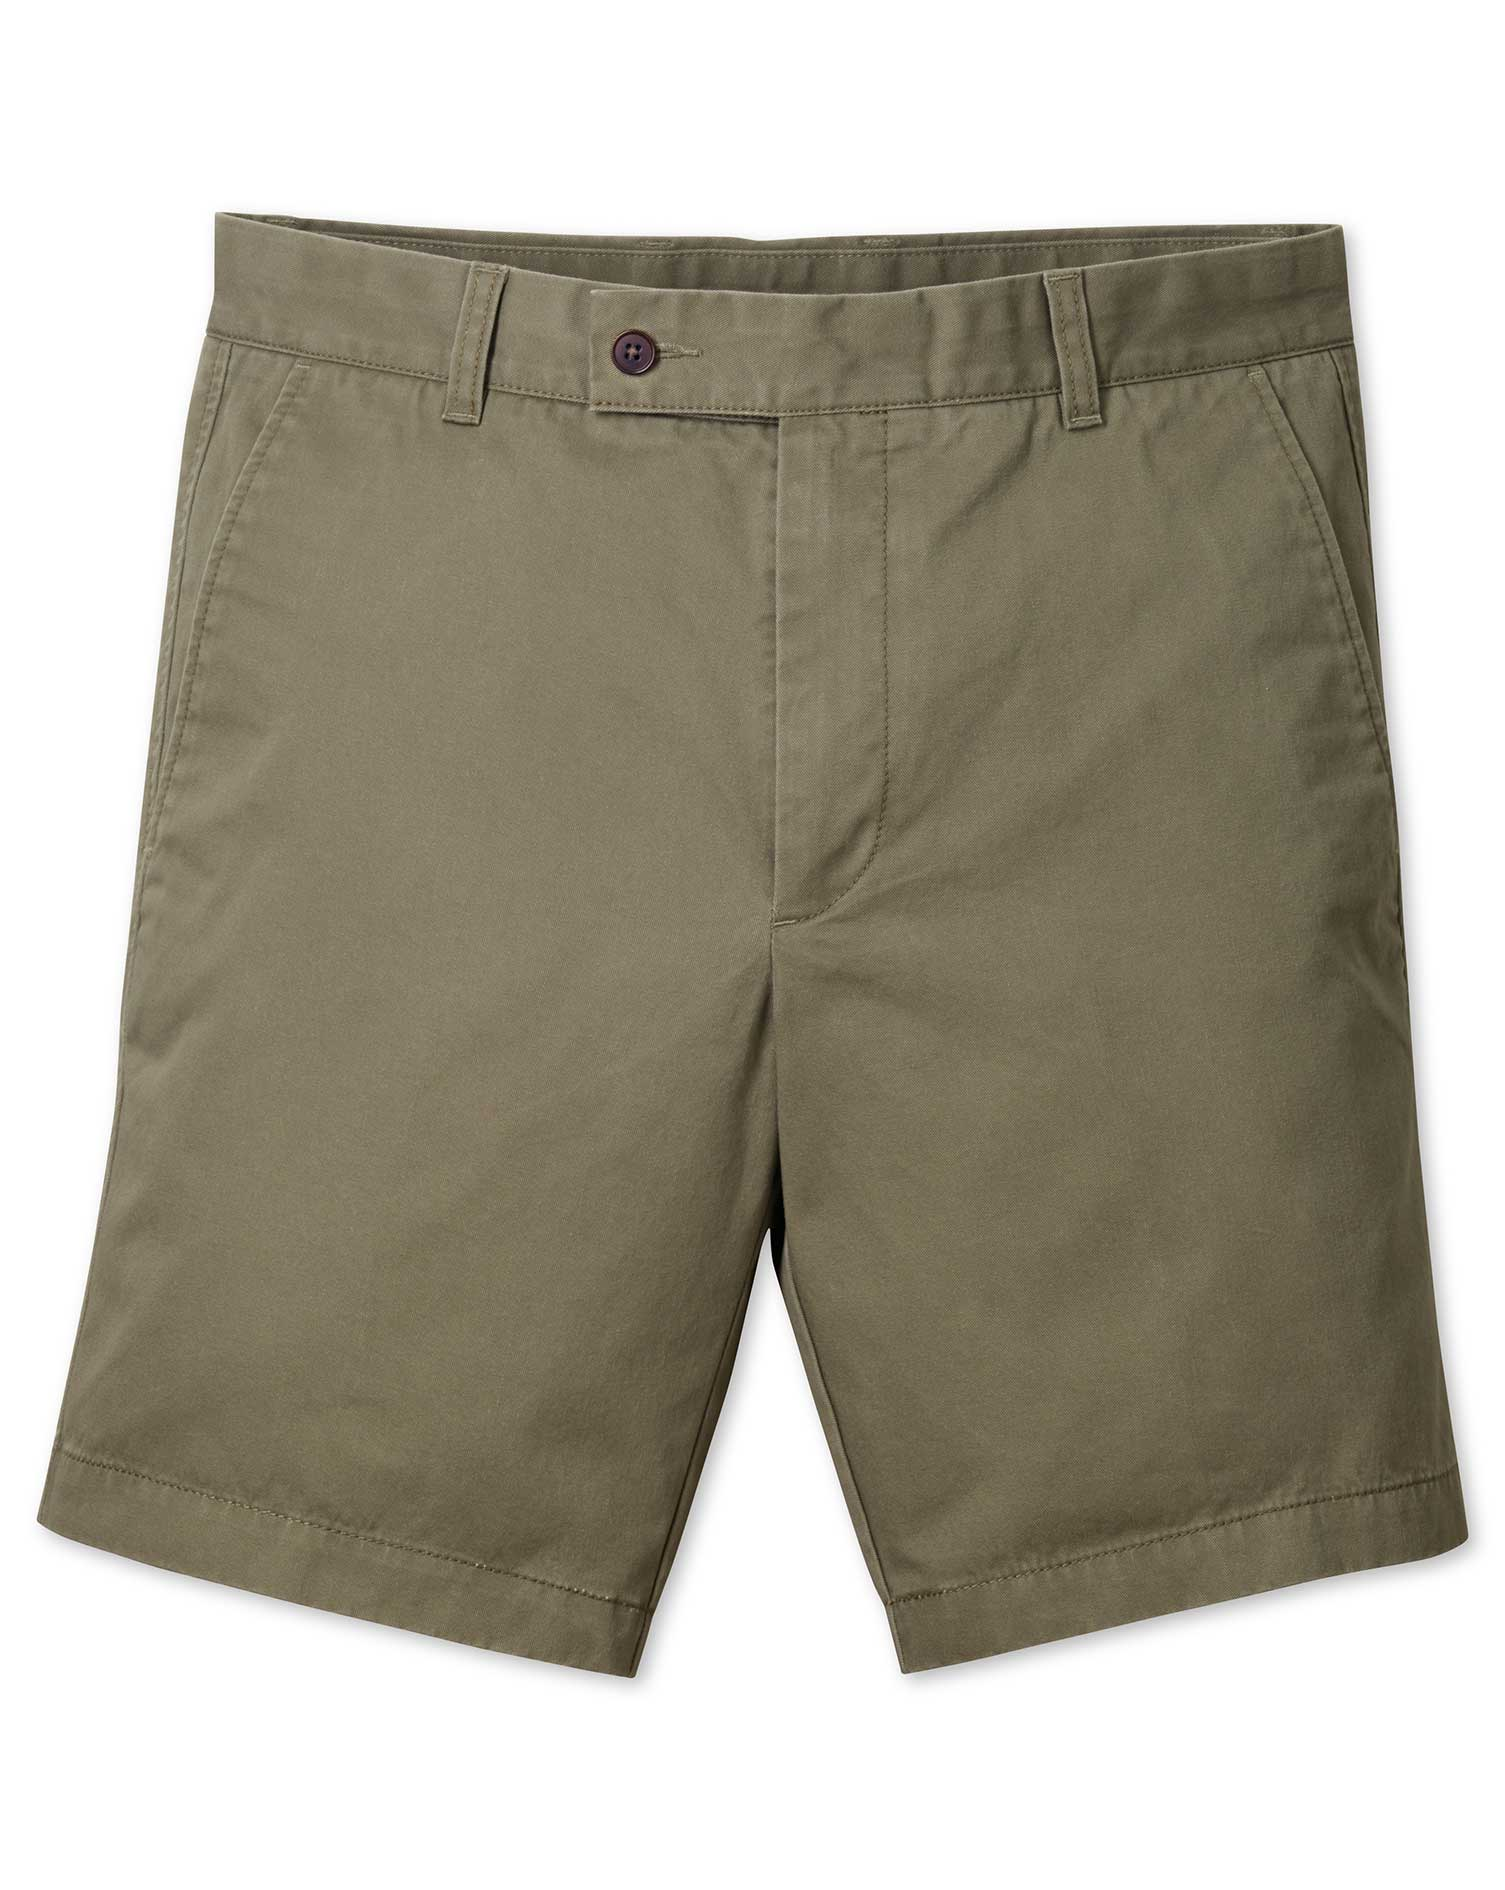 Khaki Chino Cotton Shorts Size 34 by Charles Tyrwhitt